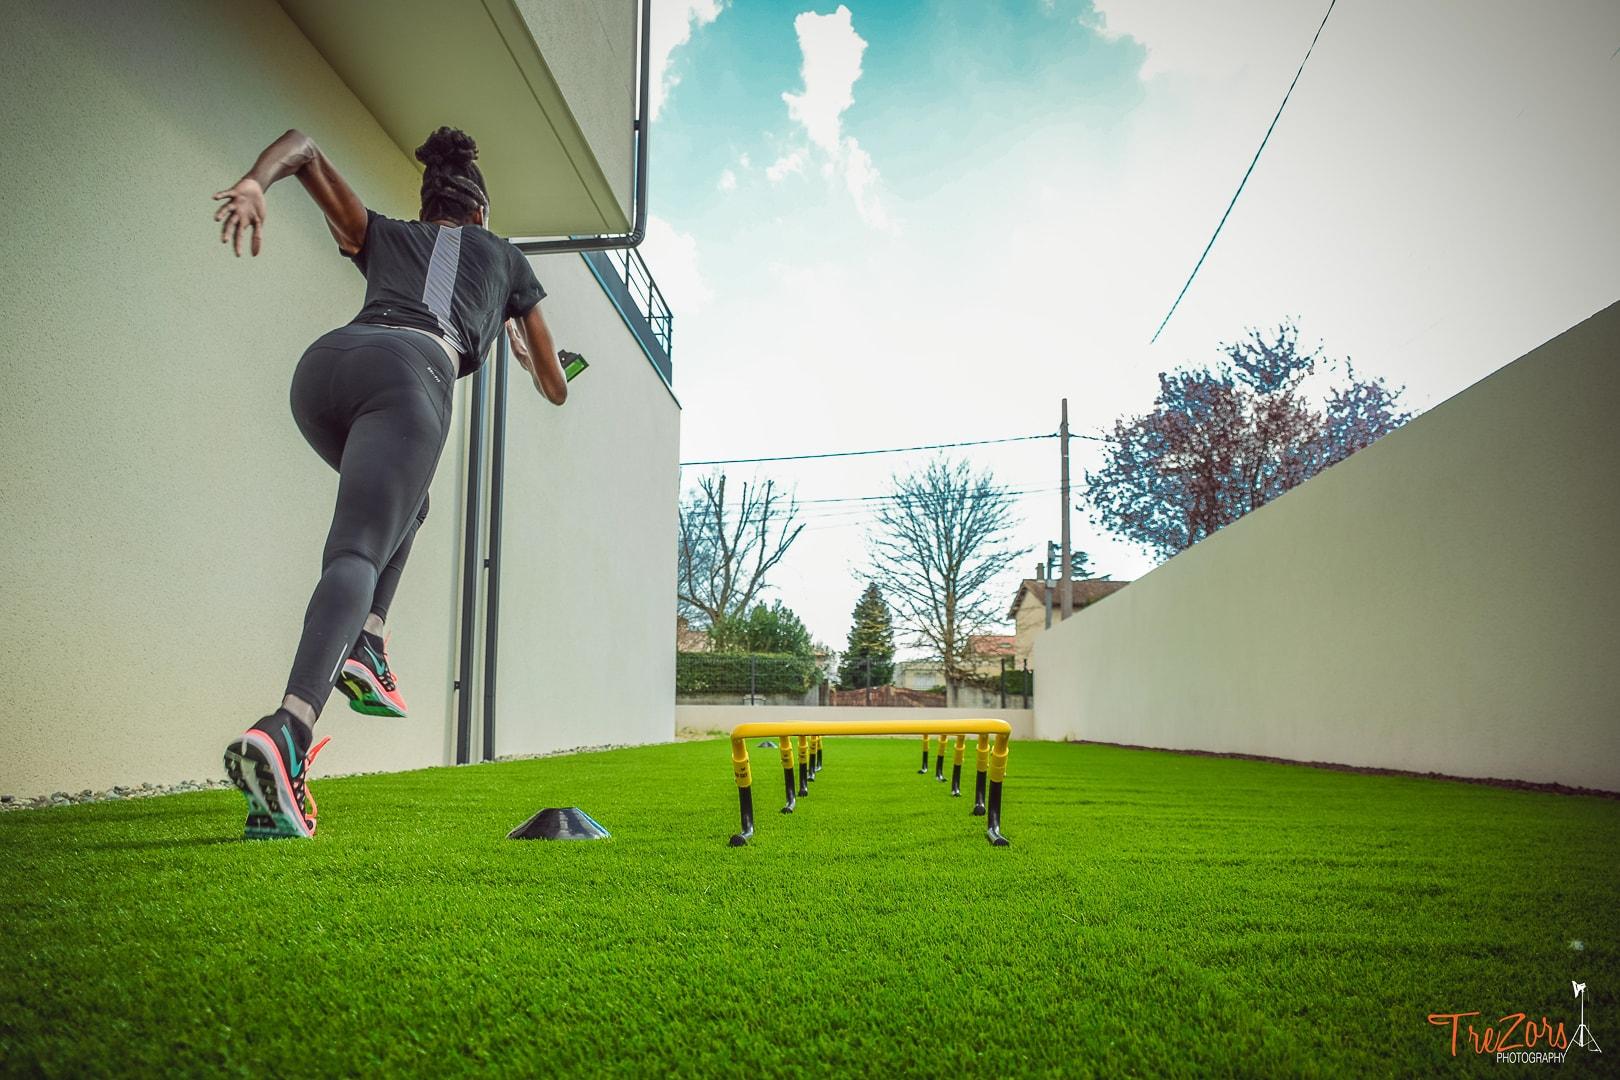 trezors-photography-photographe-professionnel-toulouse-31-sport-lifestyle-reathletisation (2)